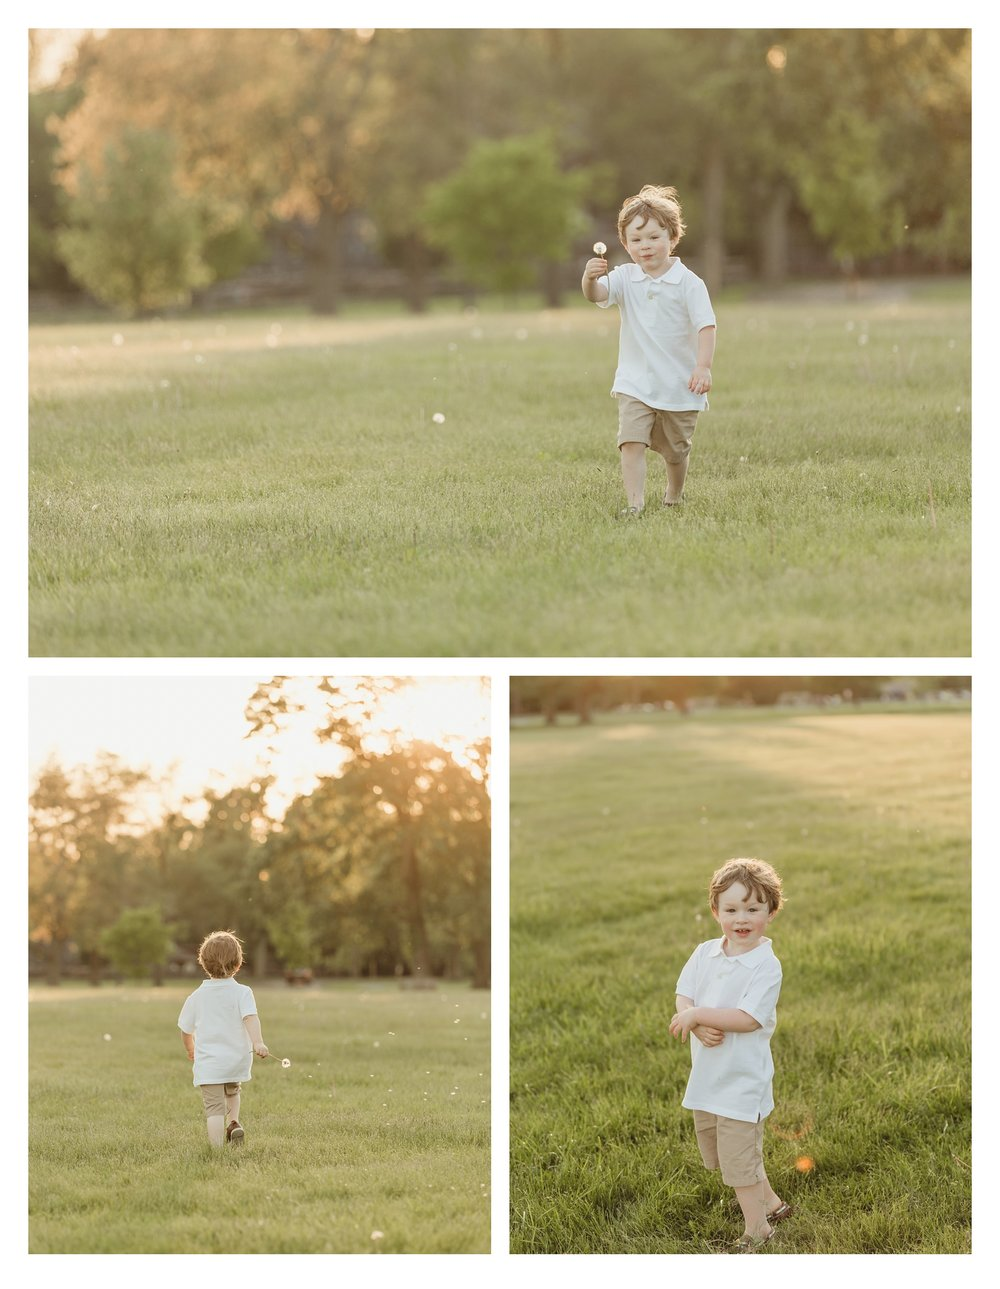 childphotographerfairfieldcountyct-wavenyparkfieldsession-kristinwoodphotography.jpg